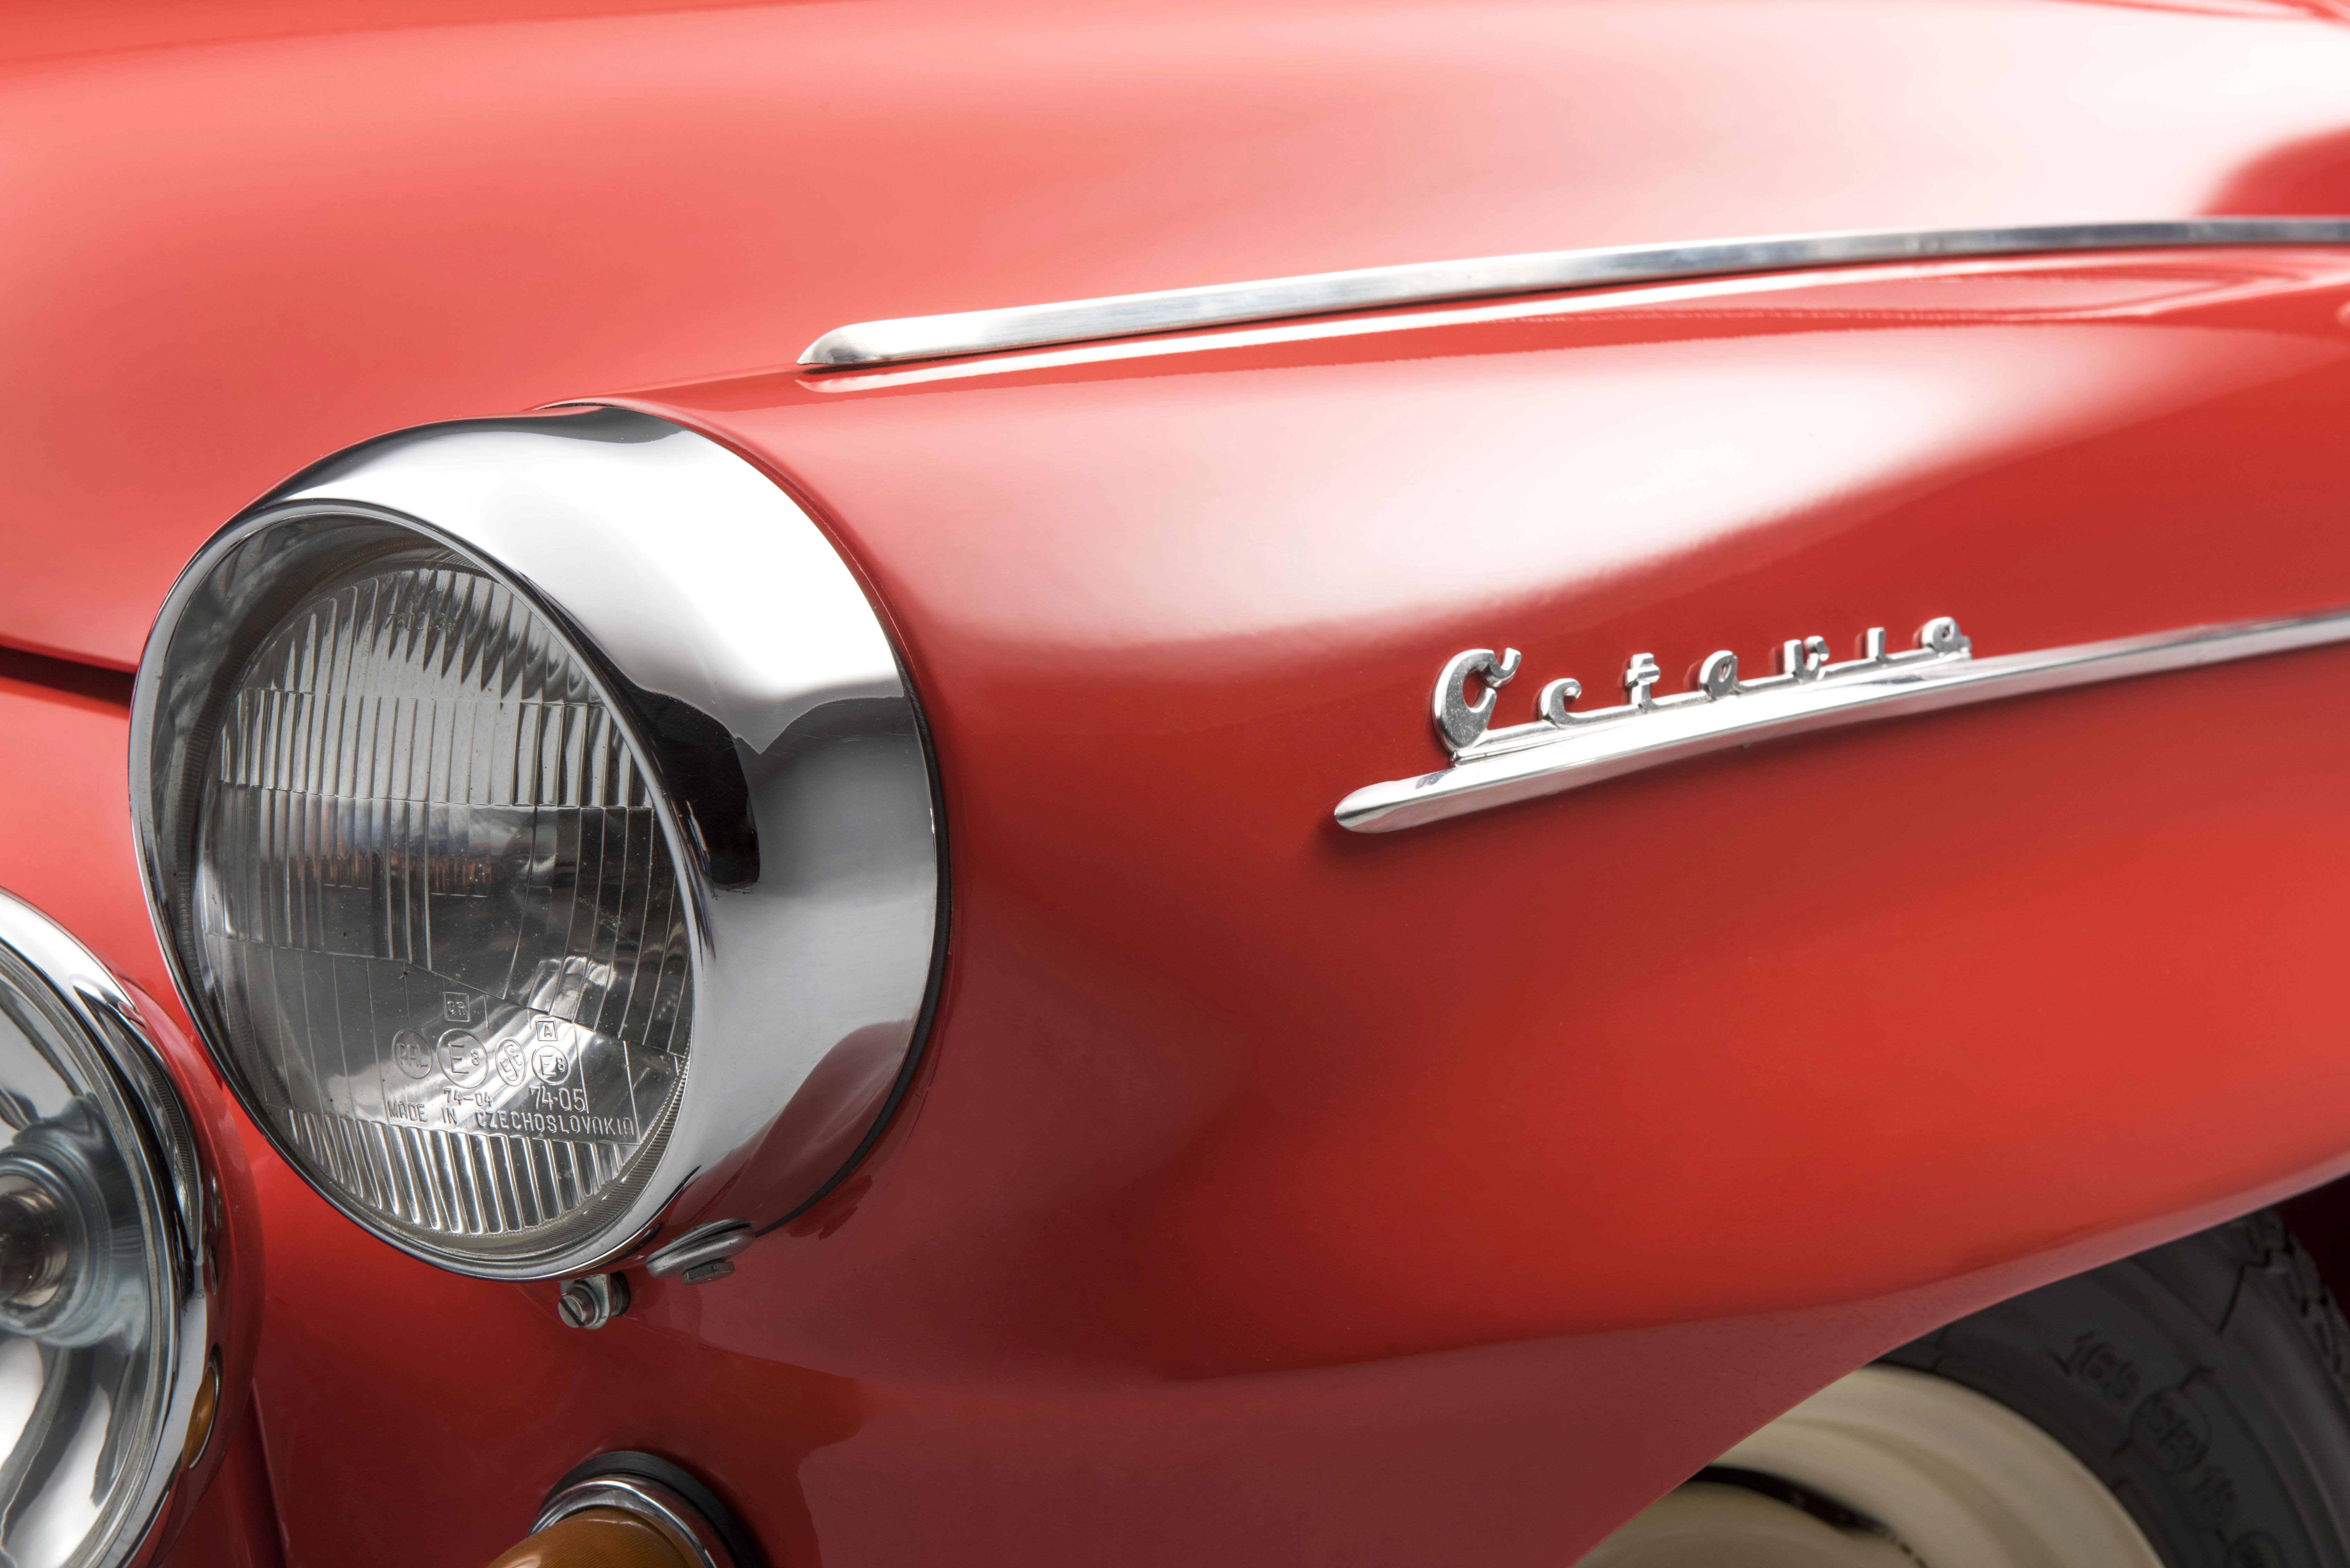 SKODA OCTAVIA TOURING SPORT (1960): Successful return to international rally courses - Image 3